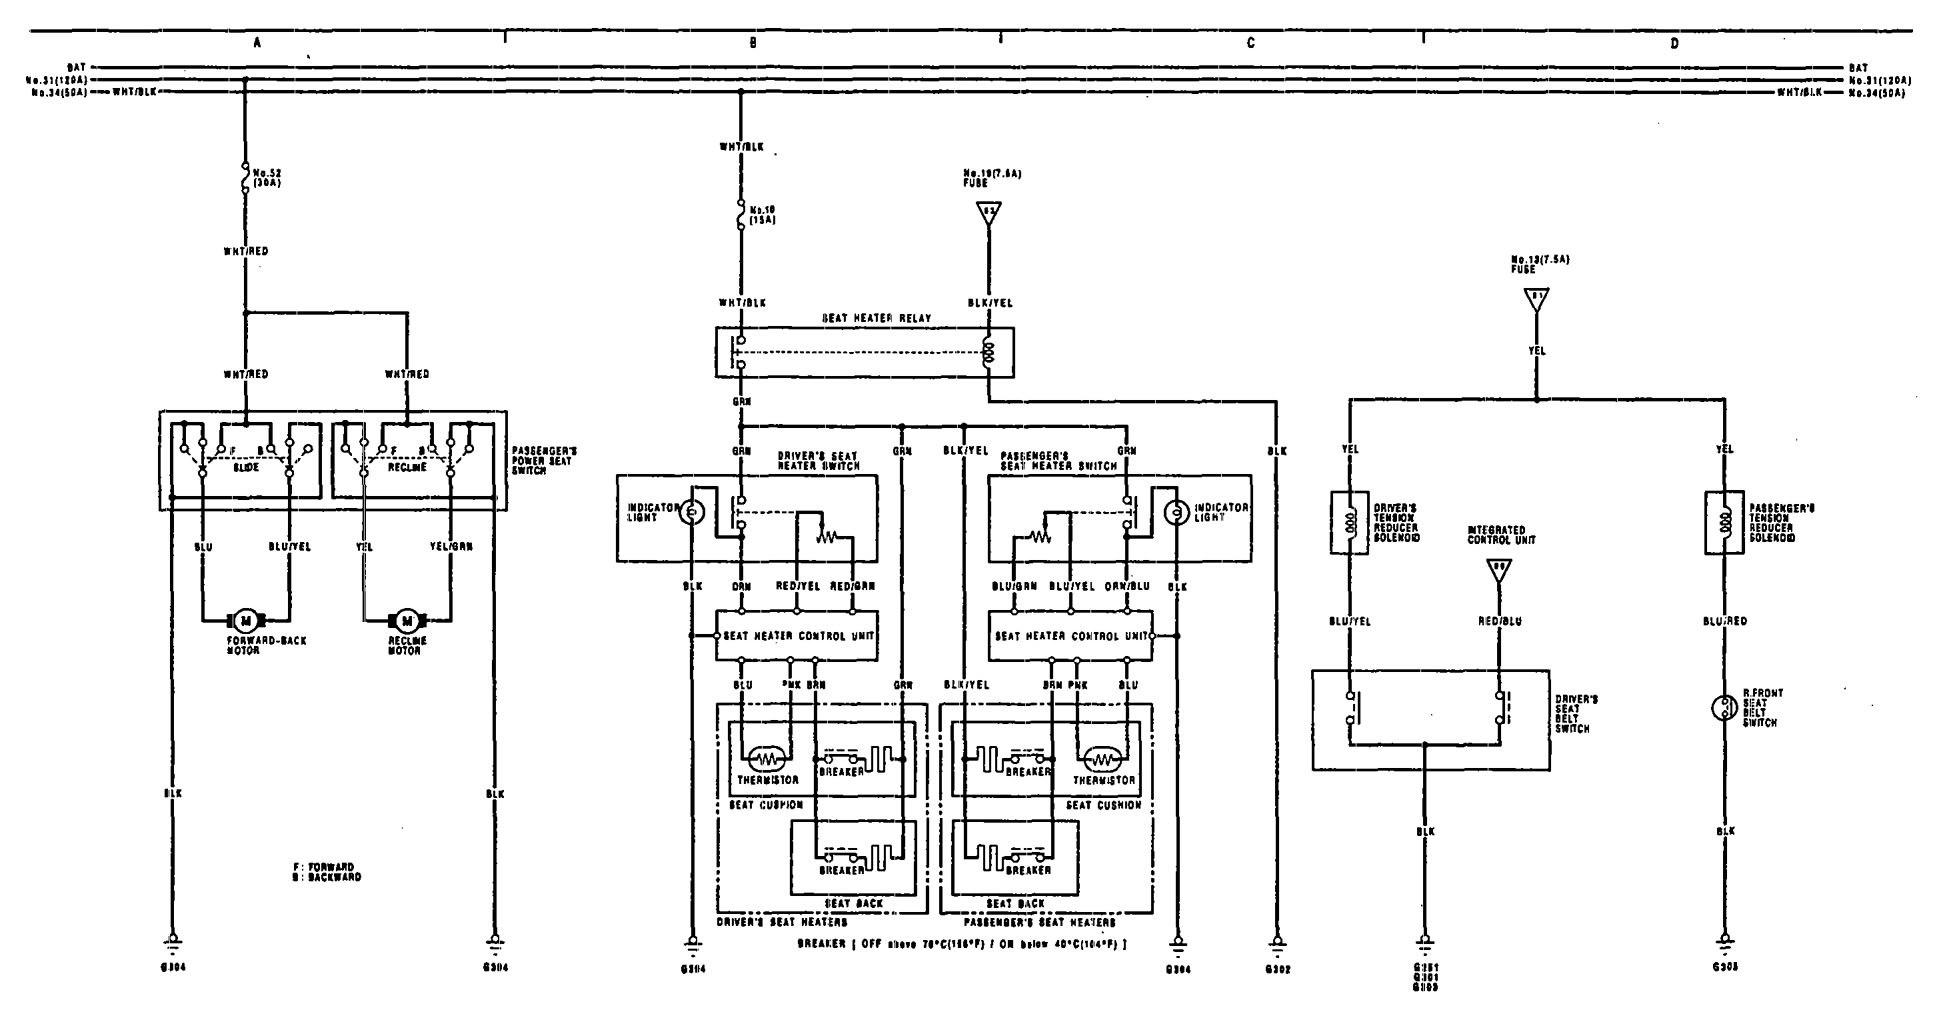 crimestopper sp 101 wiring diagram spider monkey food chain integra dome light 2000 nissan frontier